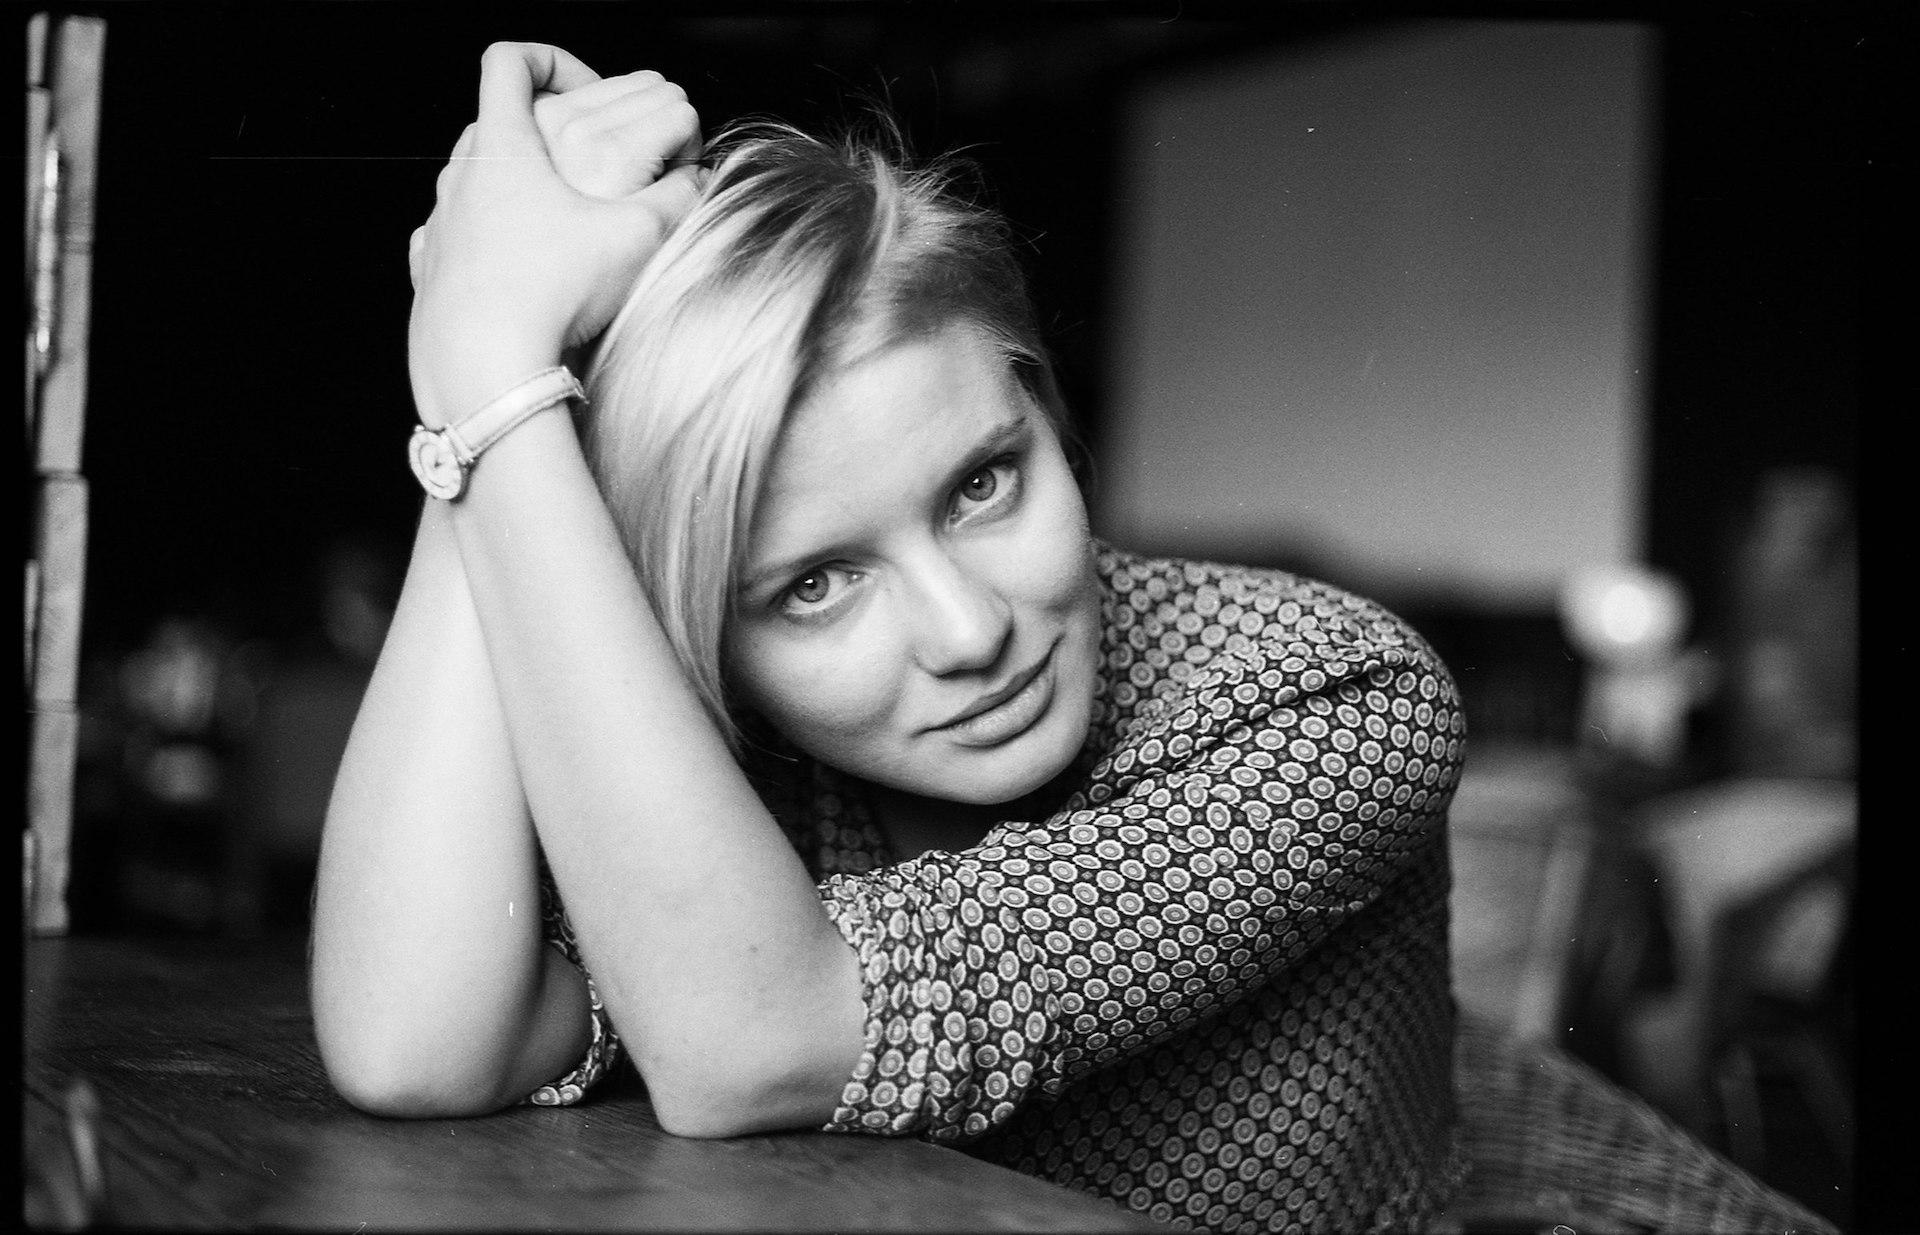 Lena Degtyar Olina Natasha